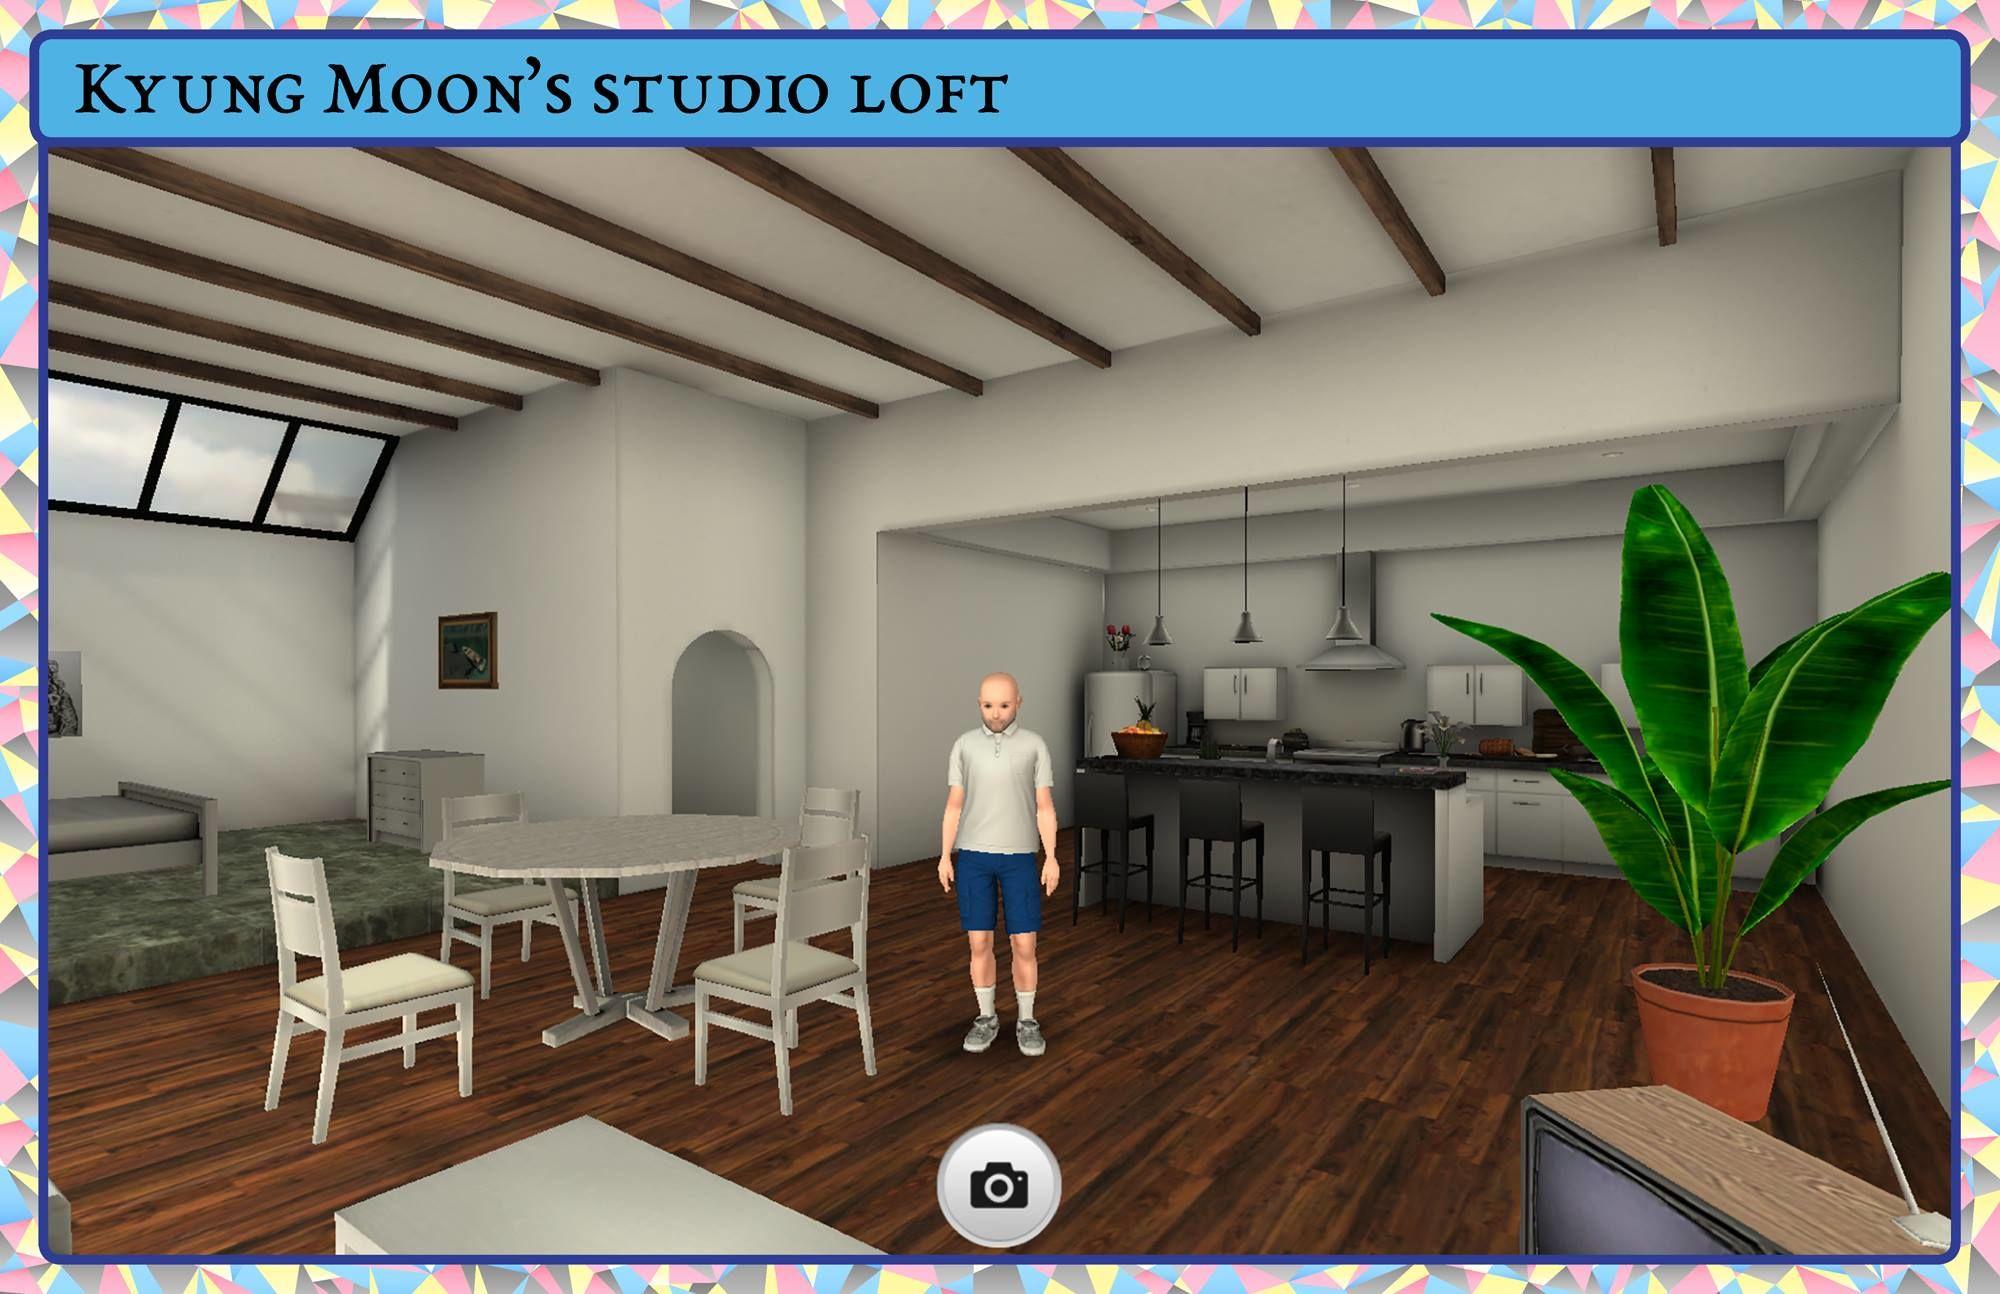 Kyung Moon's studio loft